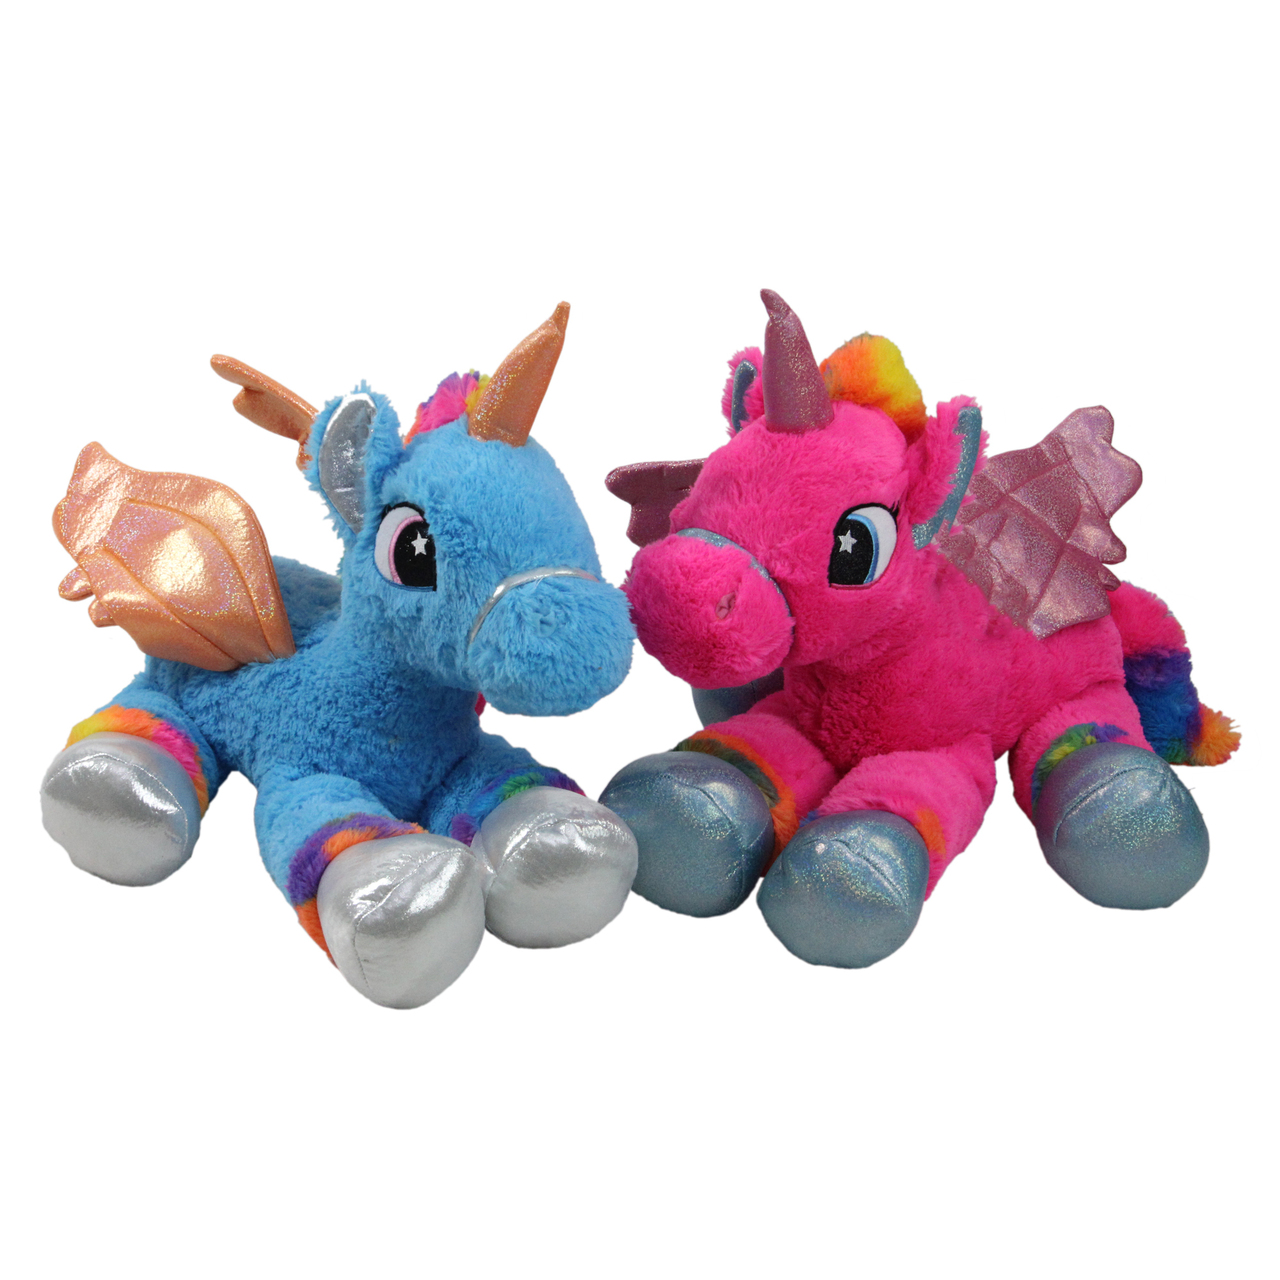 Set Of 2 Super Soft Plush Pink Blue Sitting Winged Unicorns